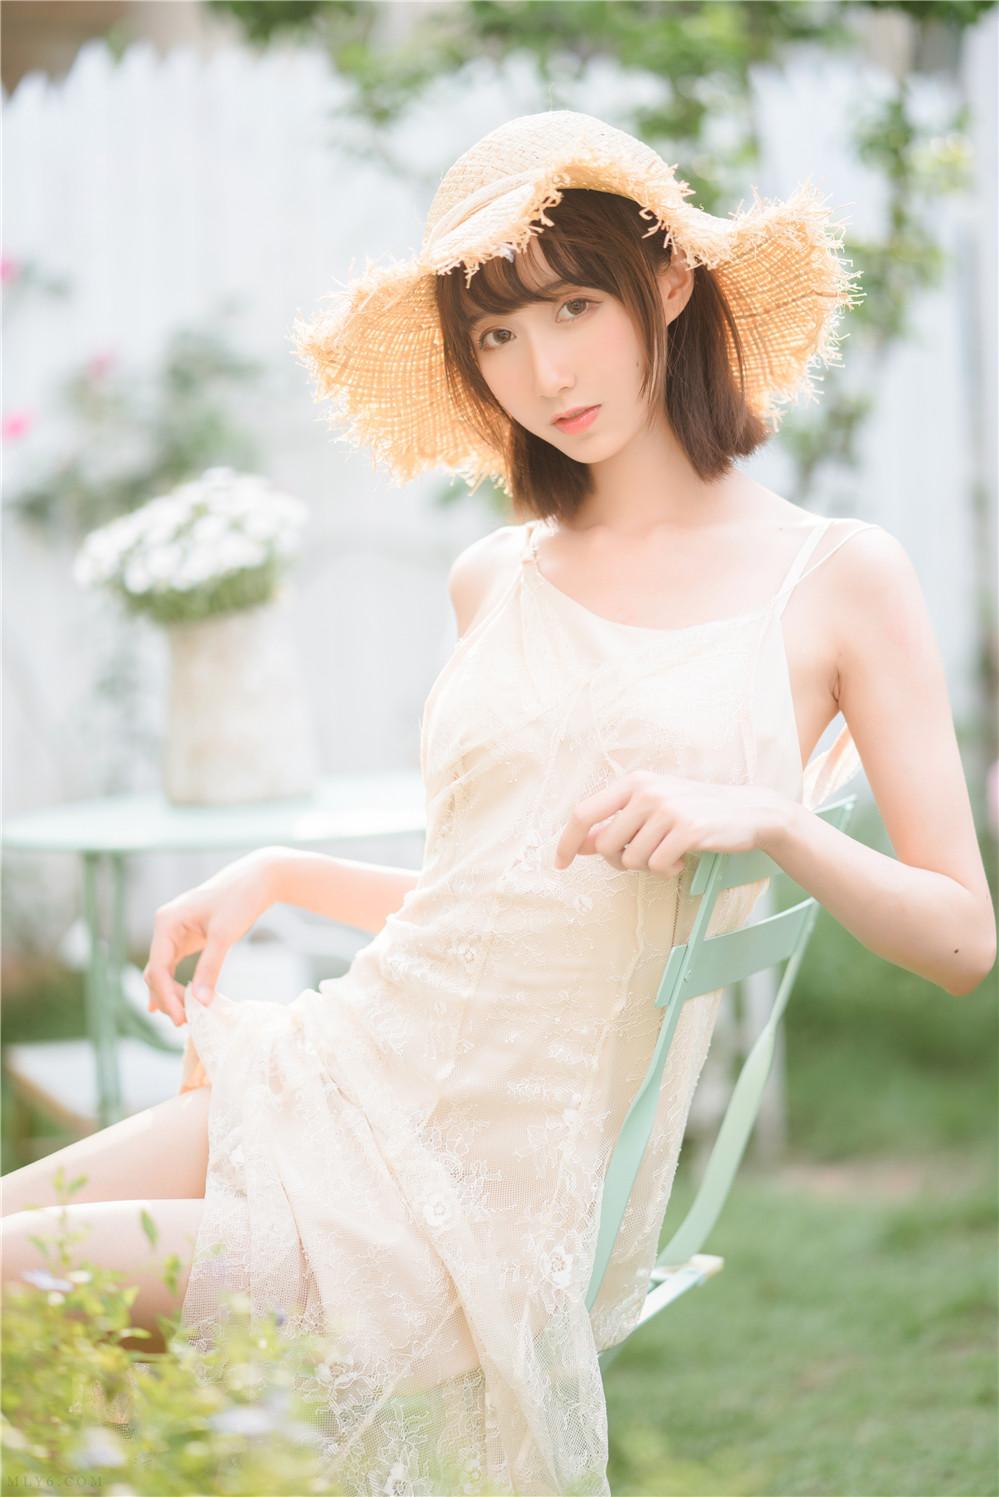 木绵绵OwO – NO.61 湿润微风 [75P-640MB]